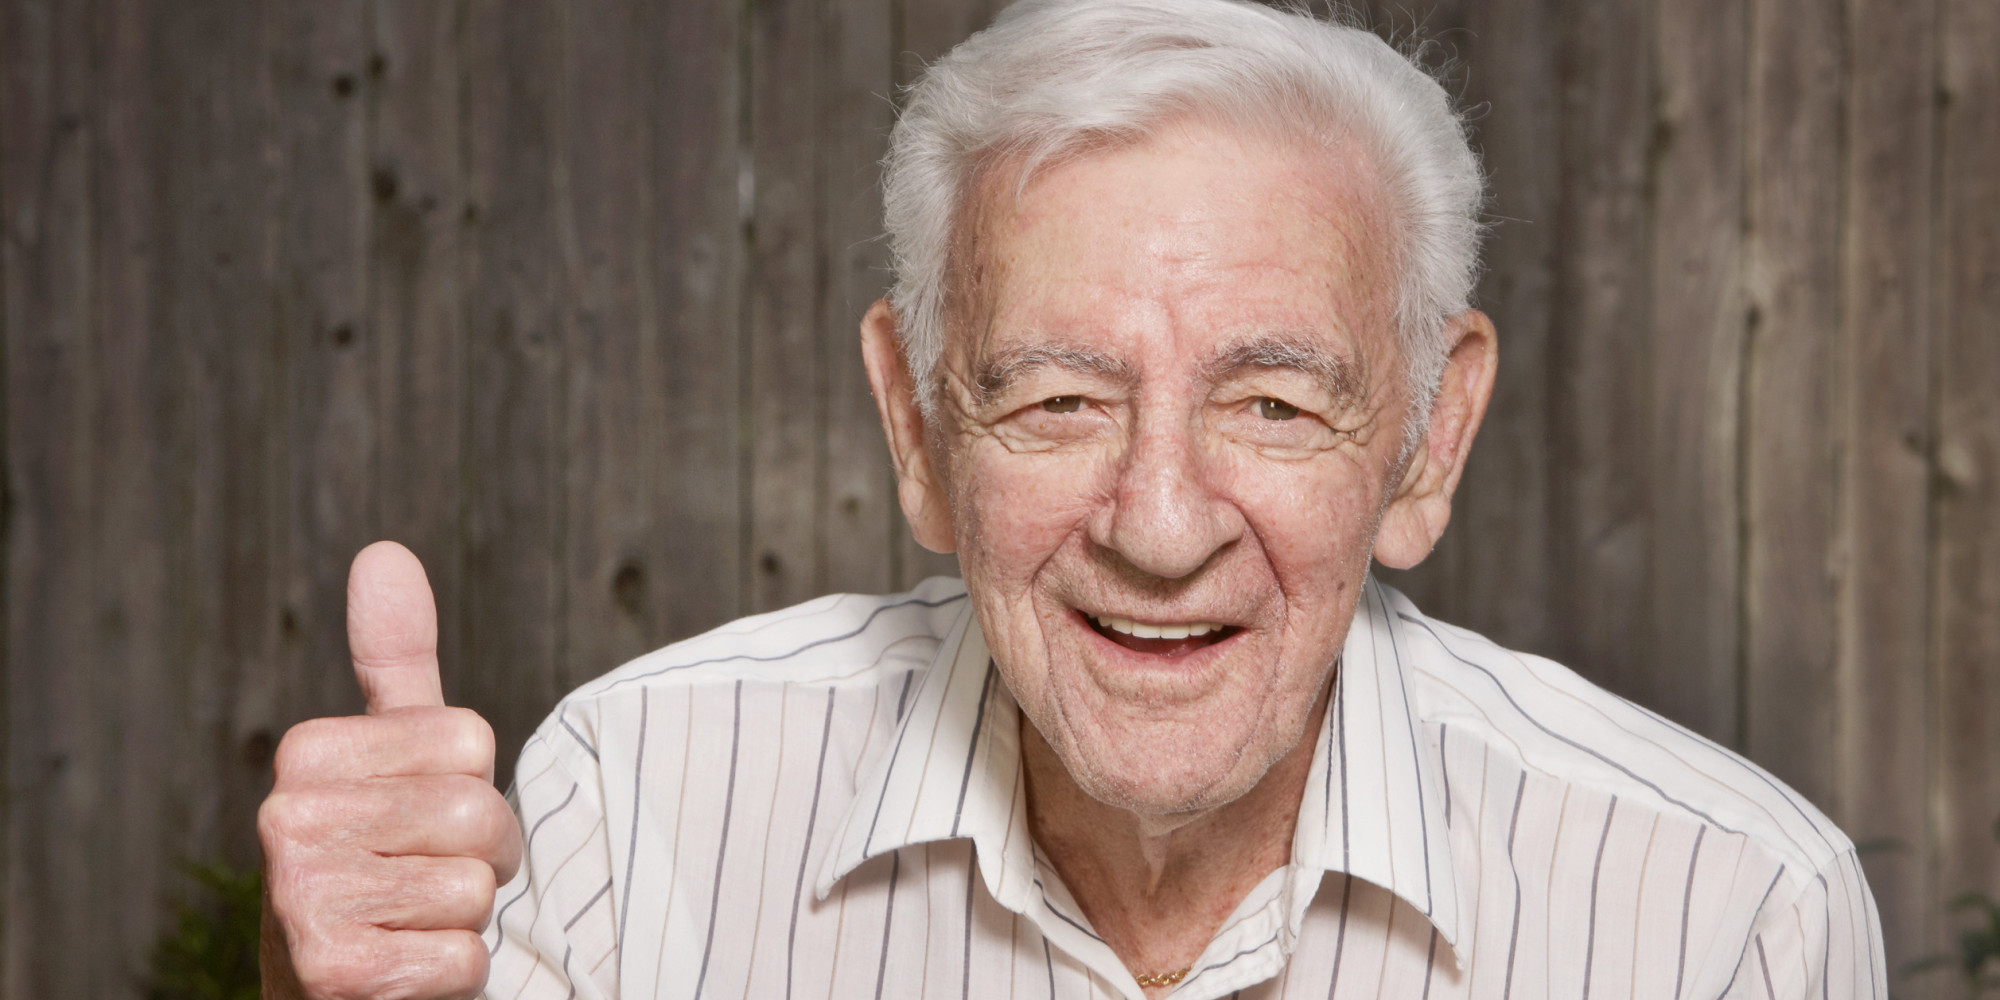 o-old-people-smiling-facebook.jpg